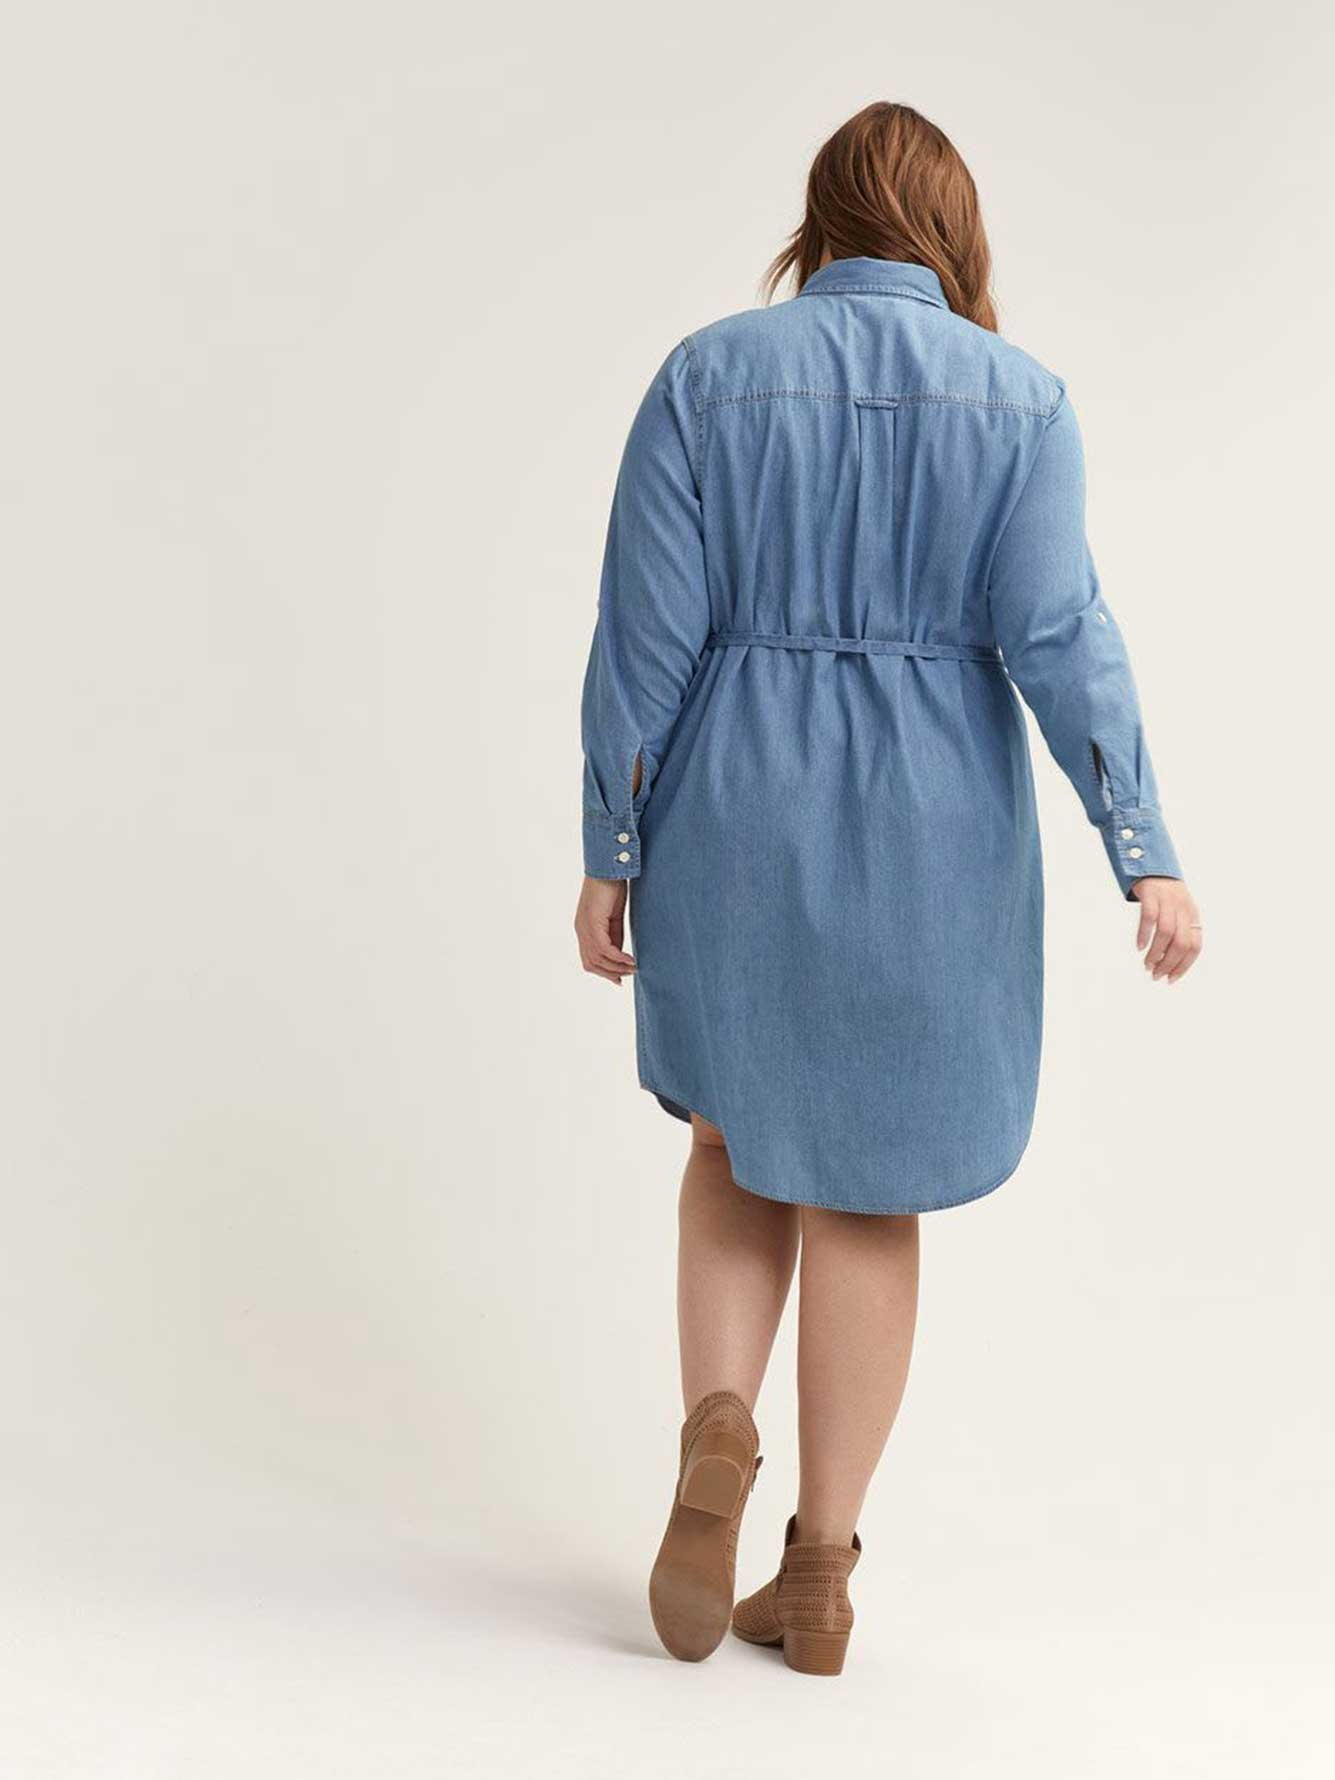 9382c441bd5 Levi s Denim Western Dress